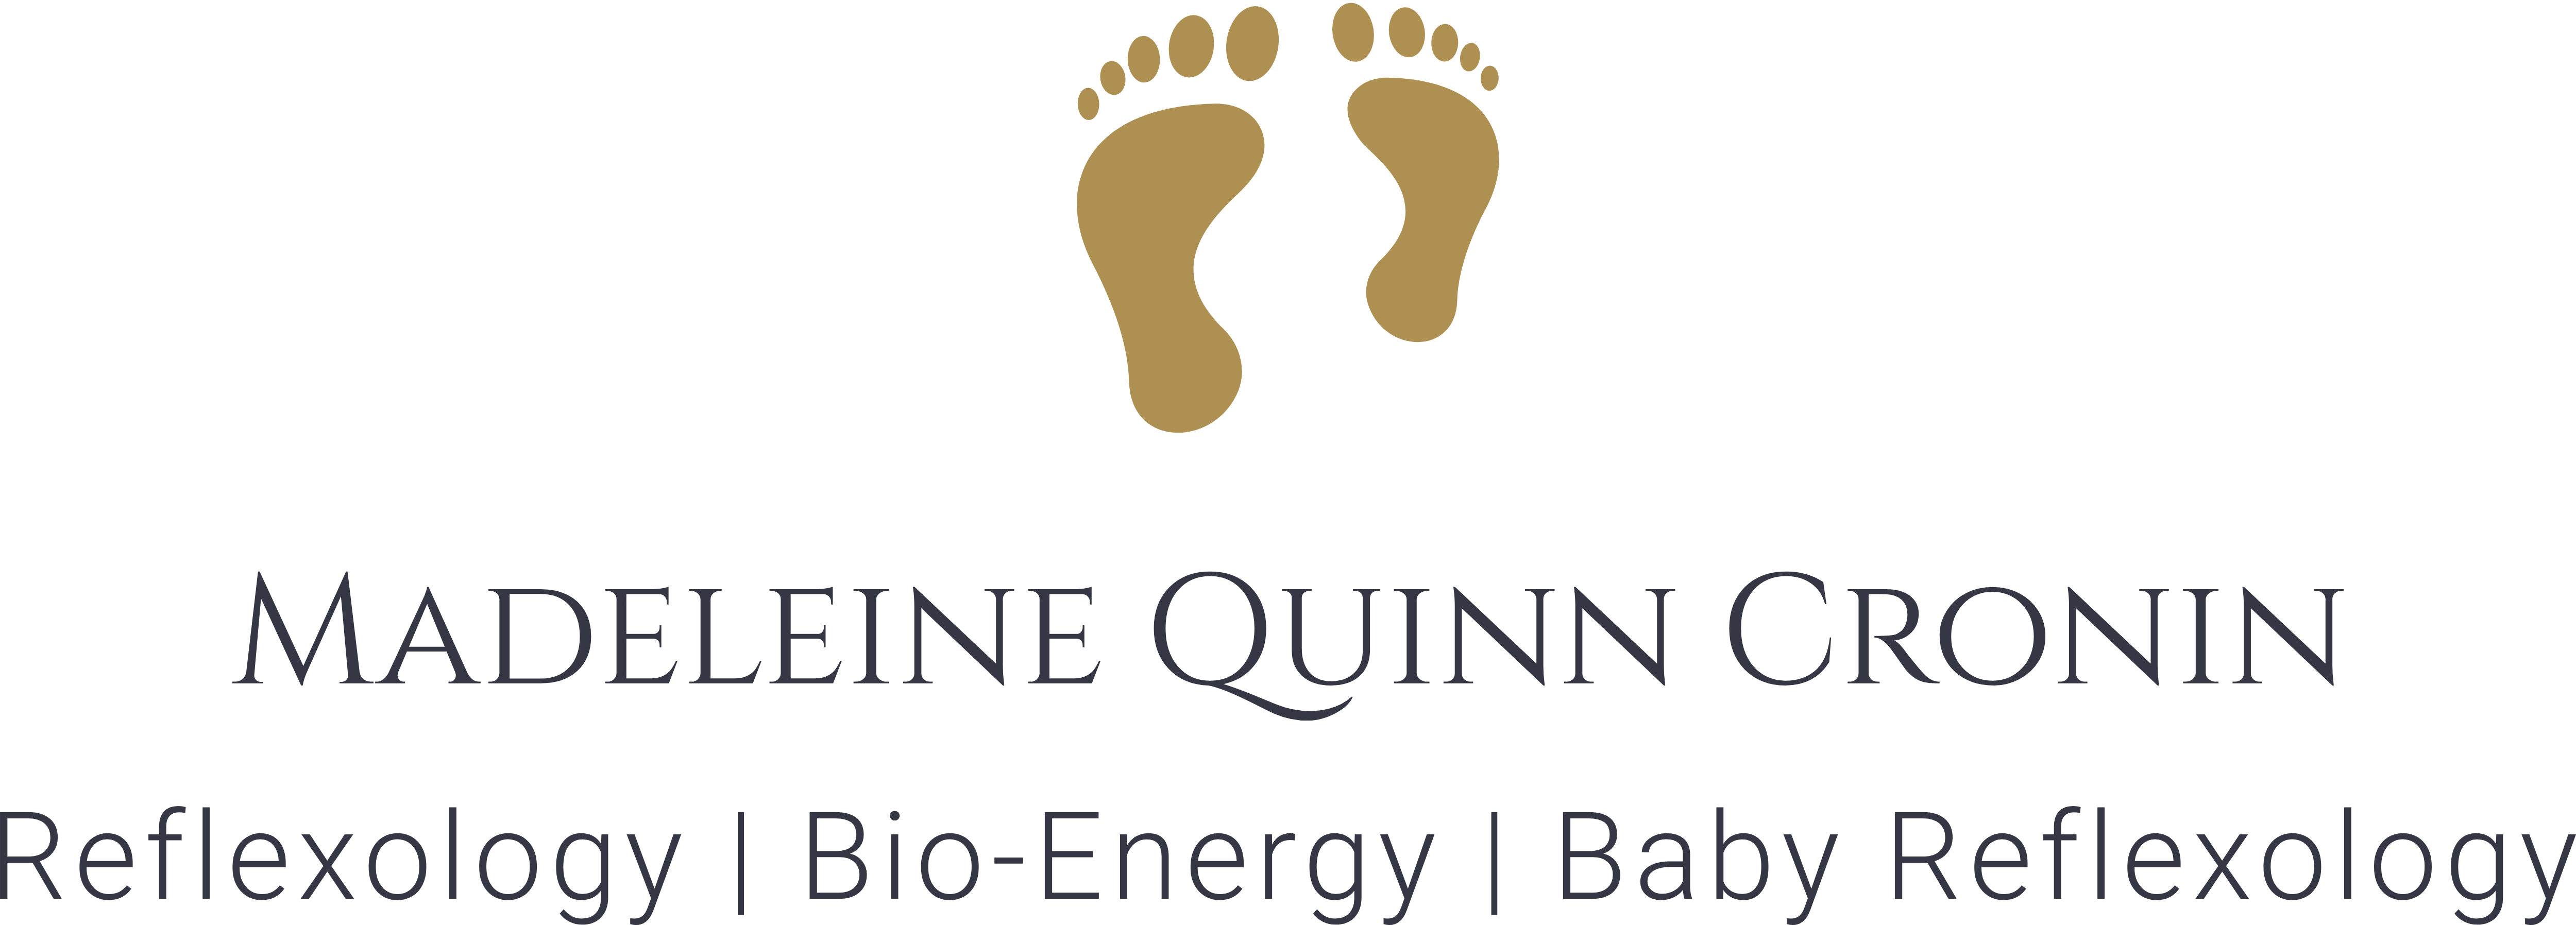 Madeleine Quinn Cronin - Reflexology Galway